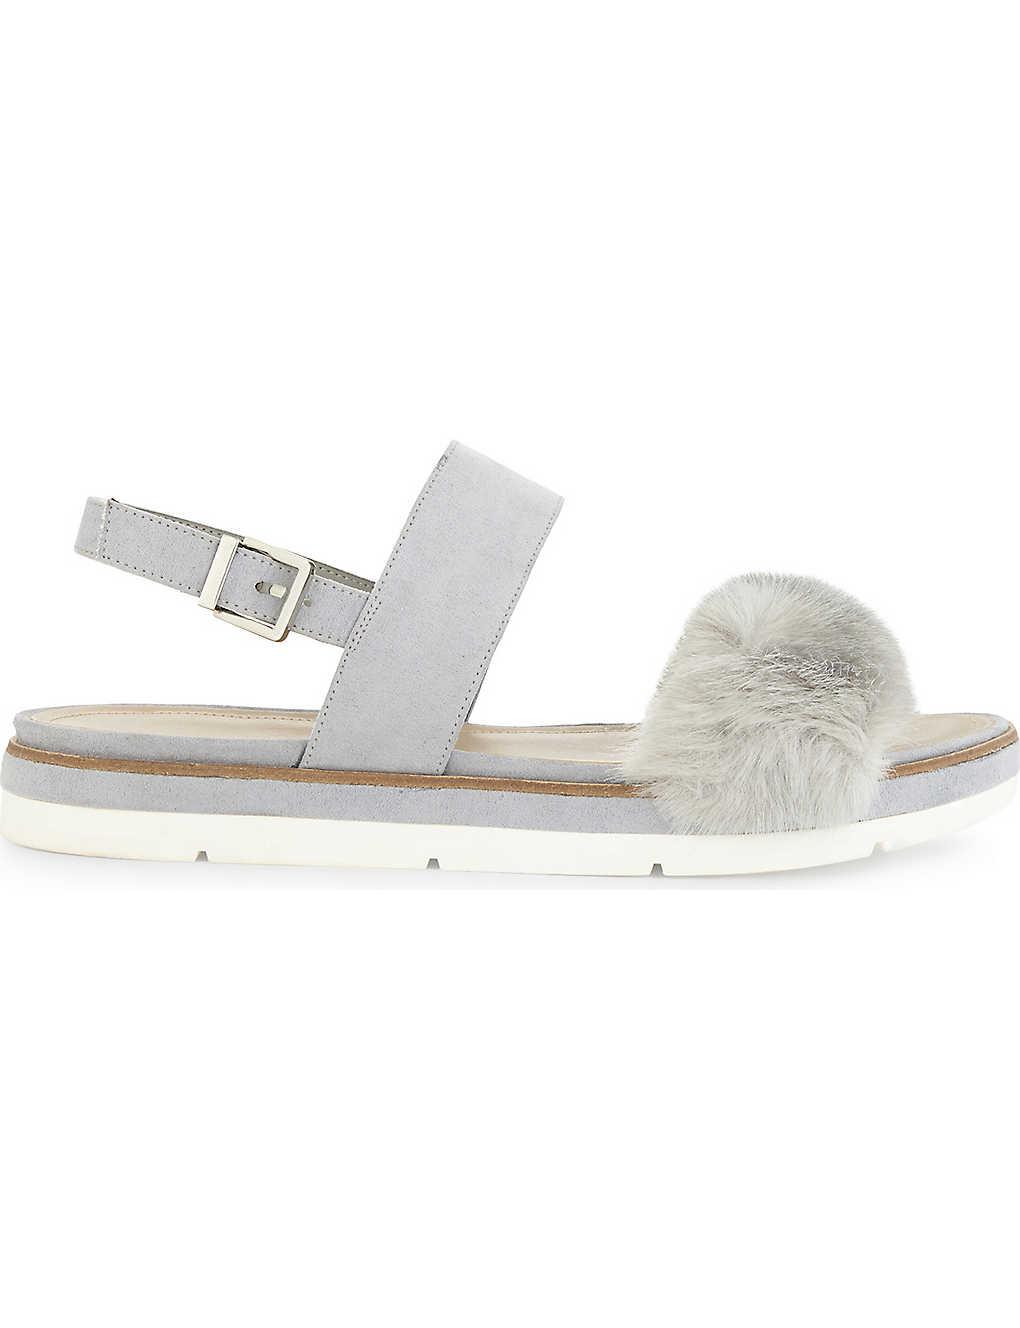 94ddcfe60d6 ALDO - Coppiano wedge sandals